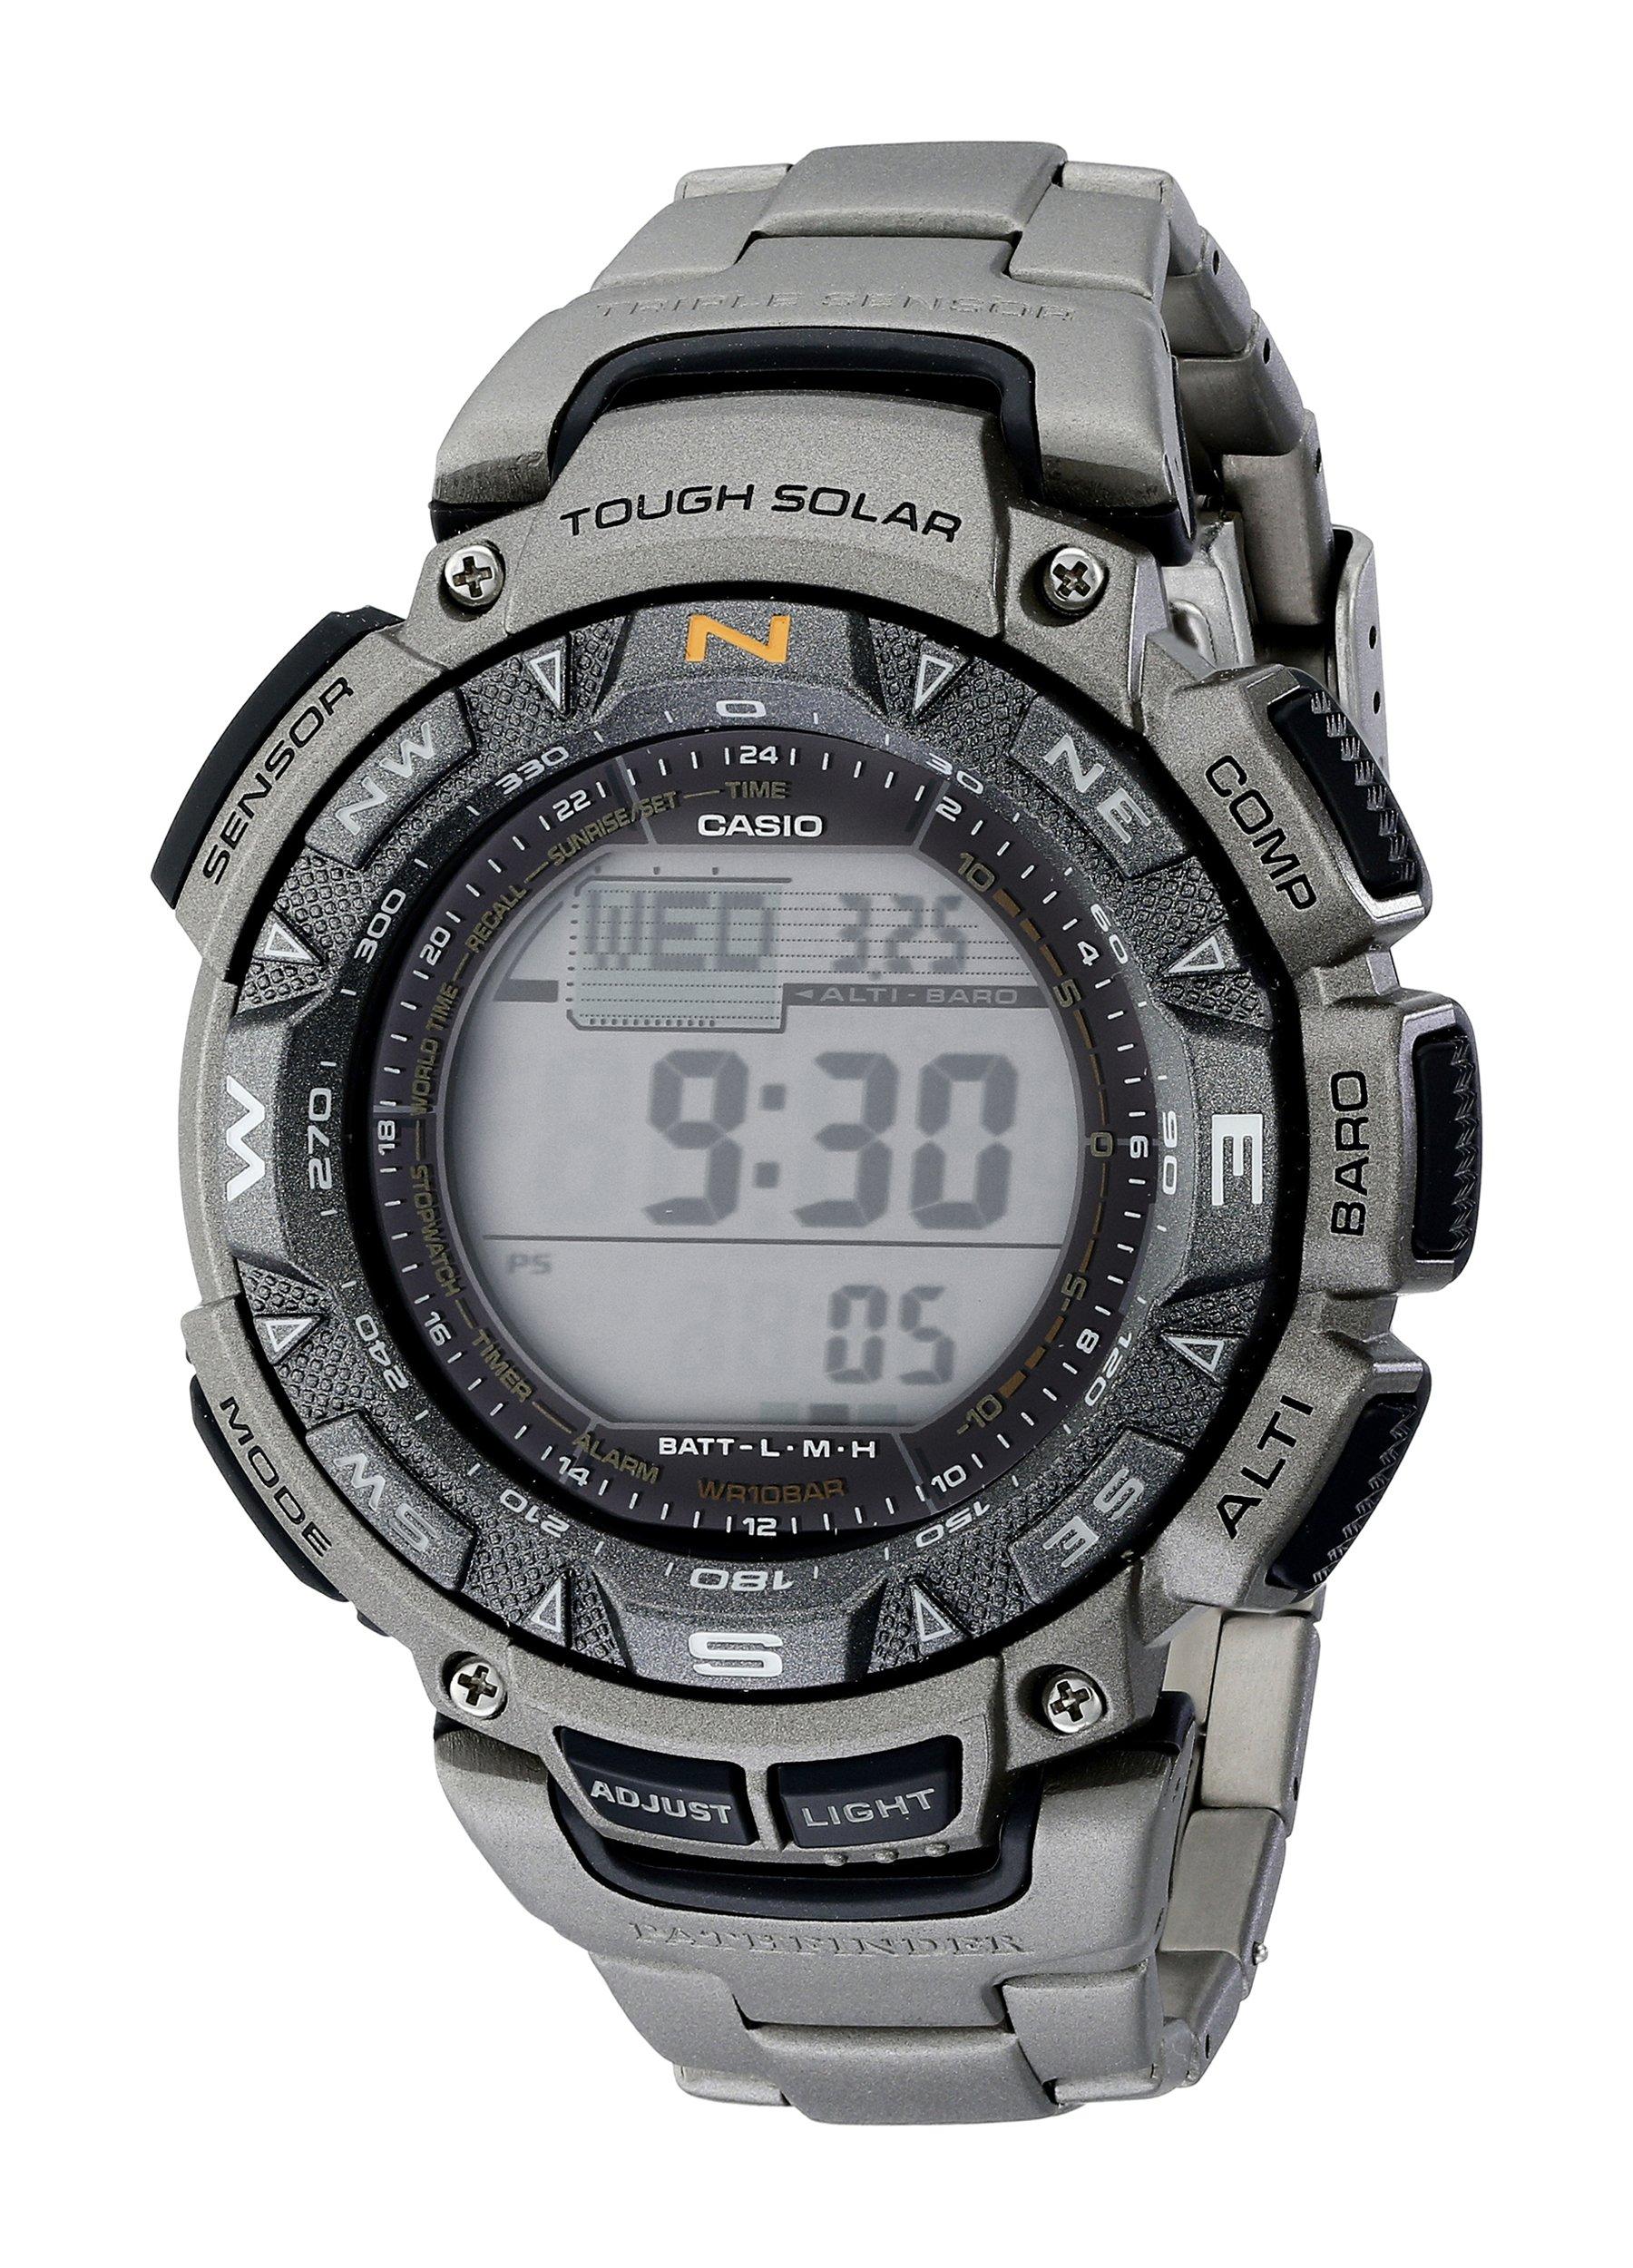 Casio Men's PAG240T-7CR Pathfinder Triple-Sensor Stainless Steel Watch with Titanium Bracelet by Casio